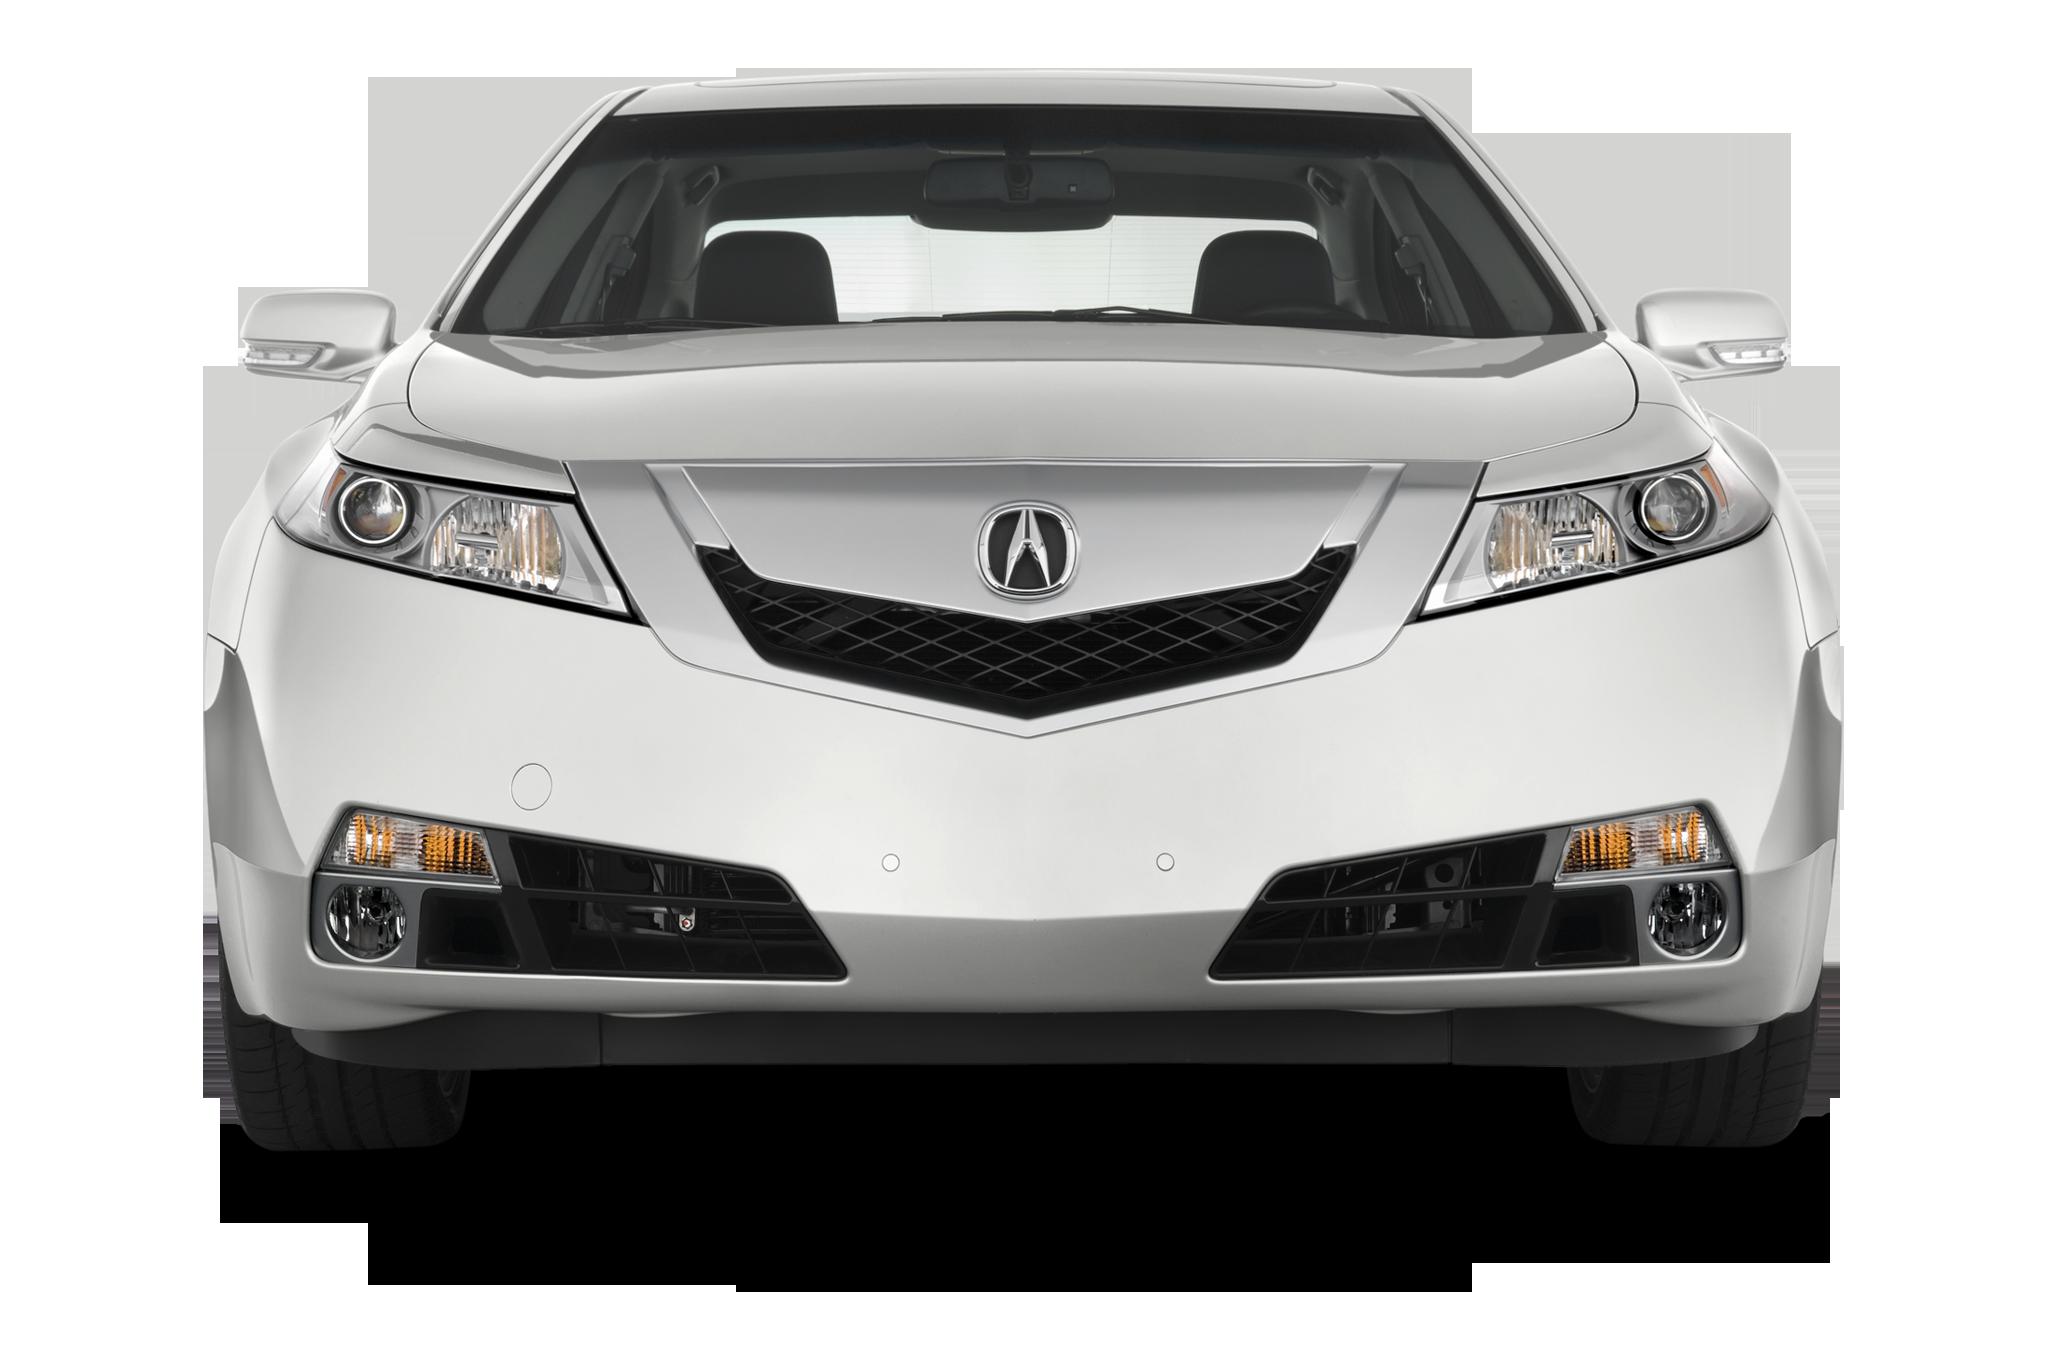 2010 acura tl sh awd 6mt acura midsize sedan review automobile